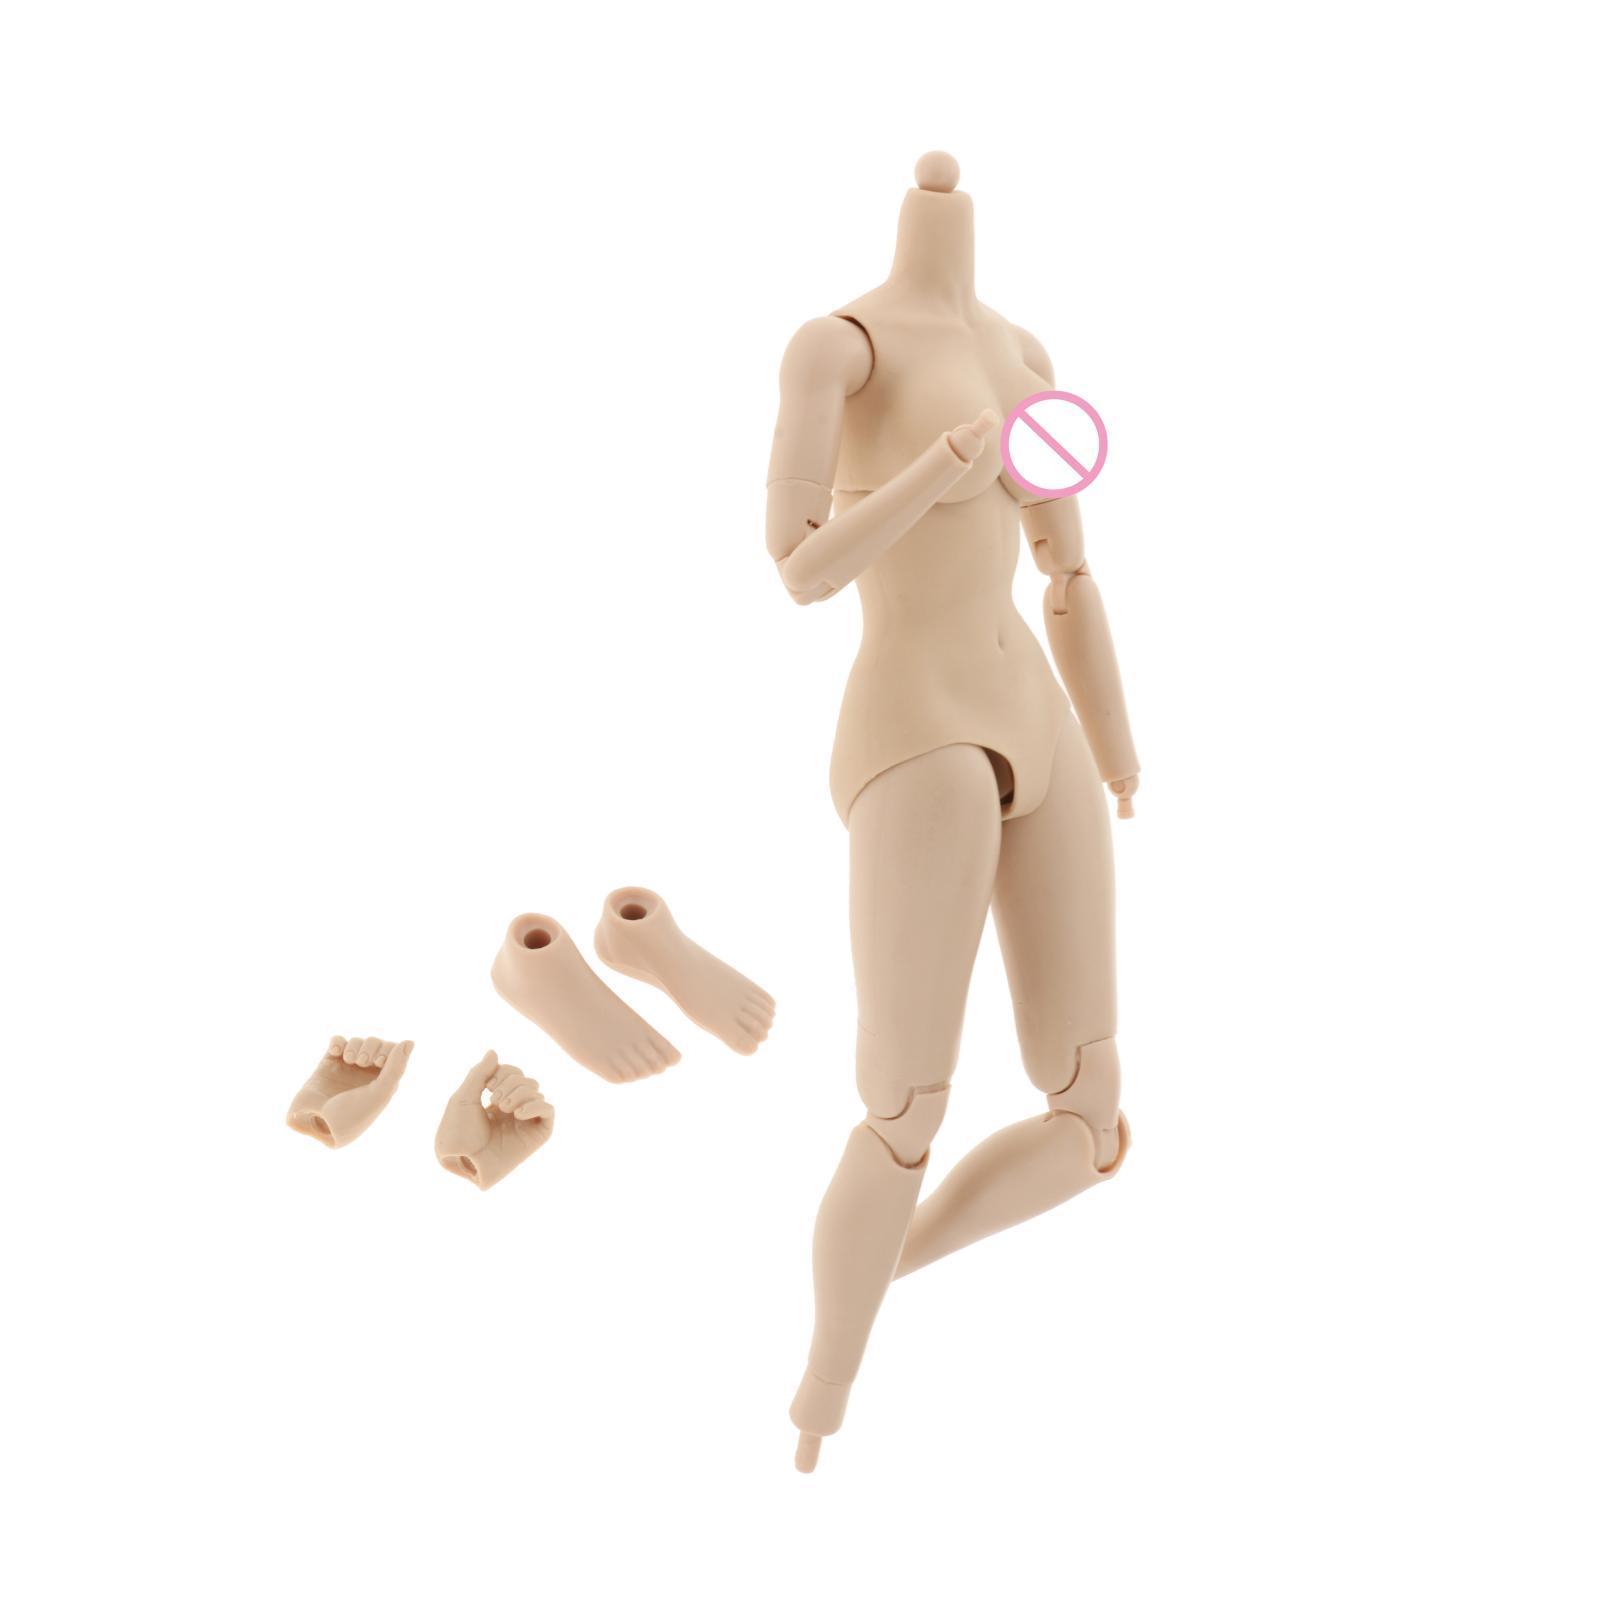 miniature 4 - 1/6 Scale Female Flexible Body 12 Inches Action Figure Body Seamless Figure